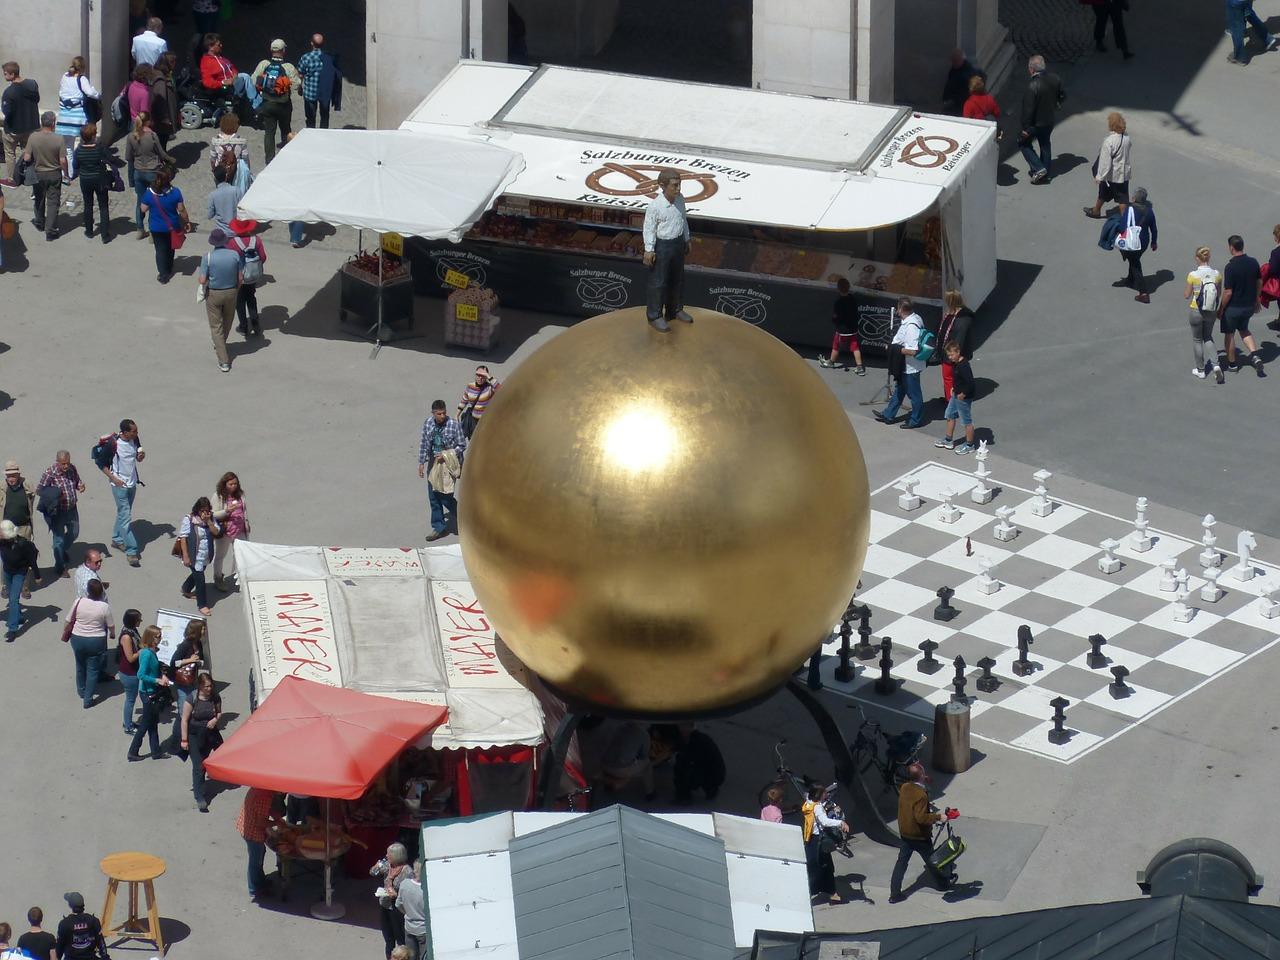 kapitelplatz-122963_1280